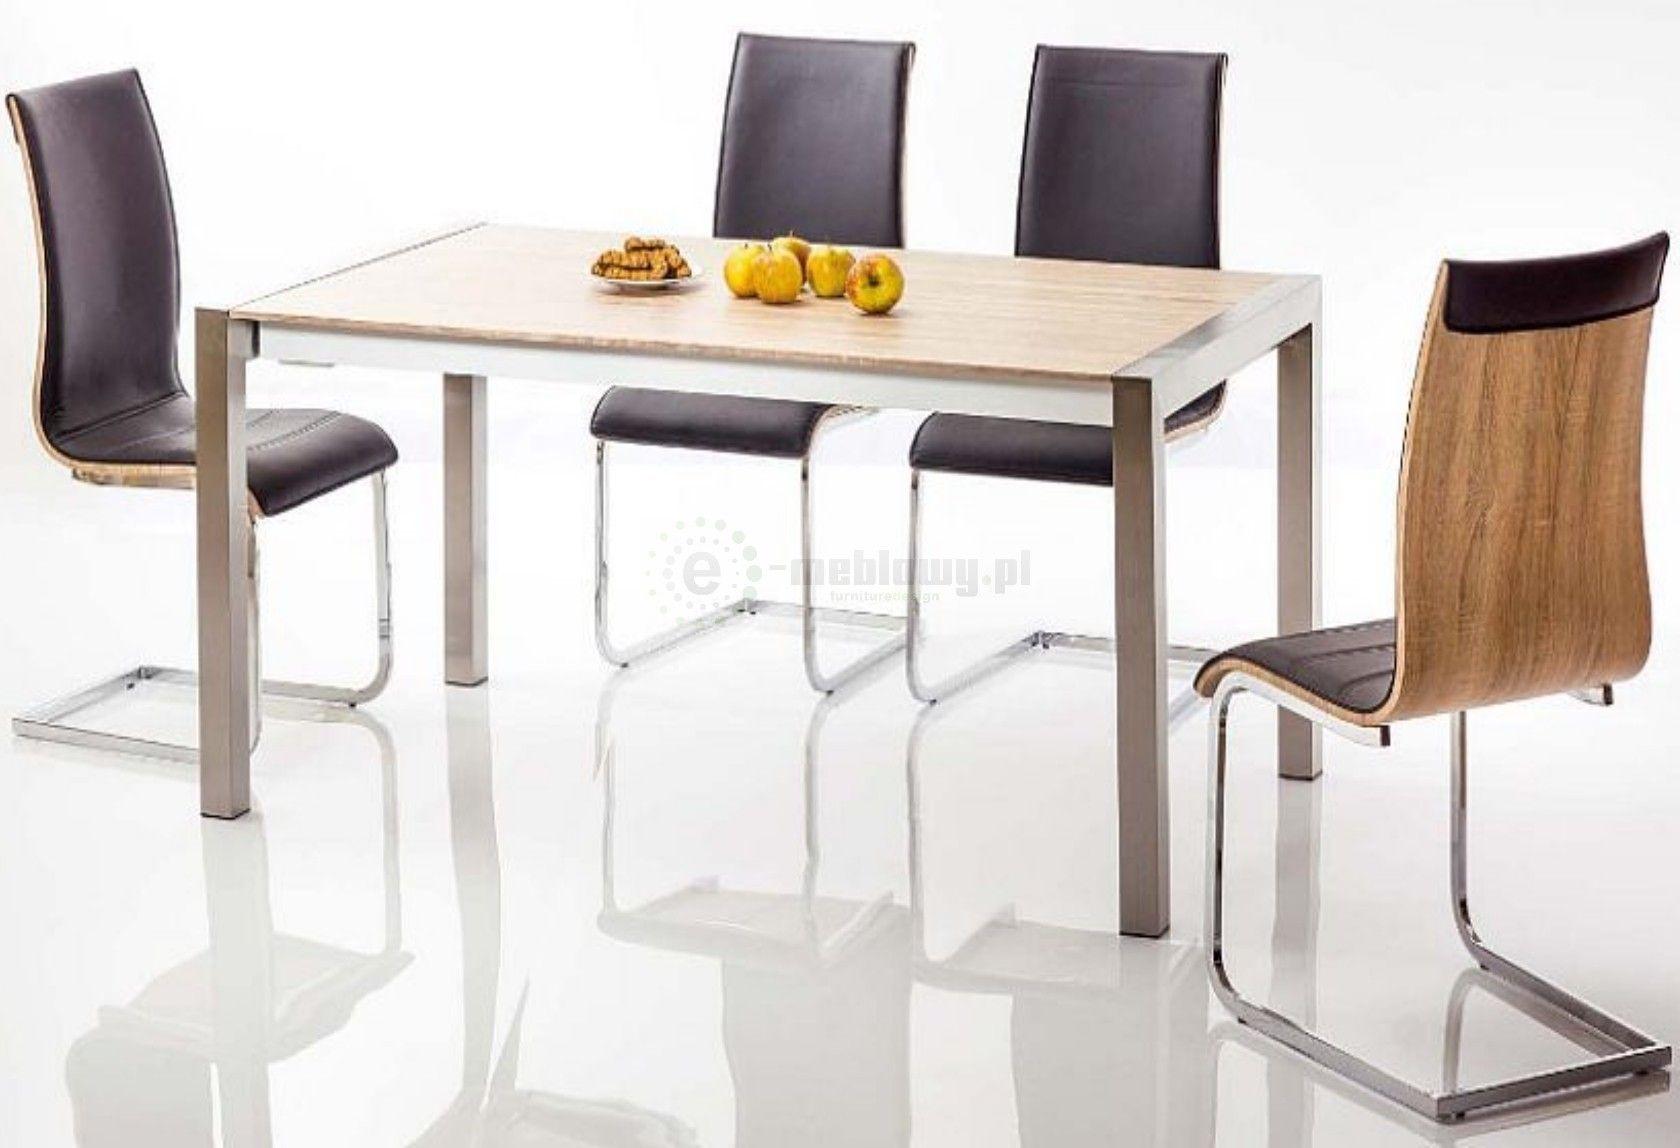 Stol Rozkladany Marco Stol Szklany Nowoczesny Stol Do Jadalni Stol Bar Table Table Home Decor